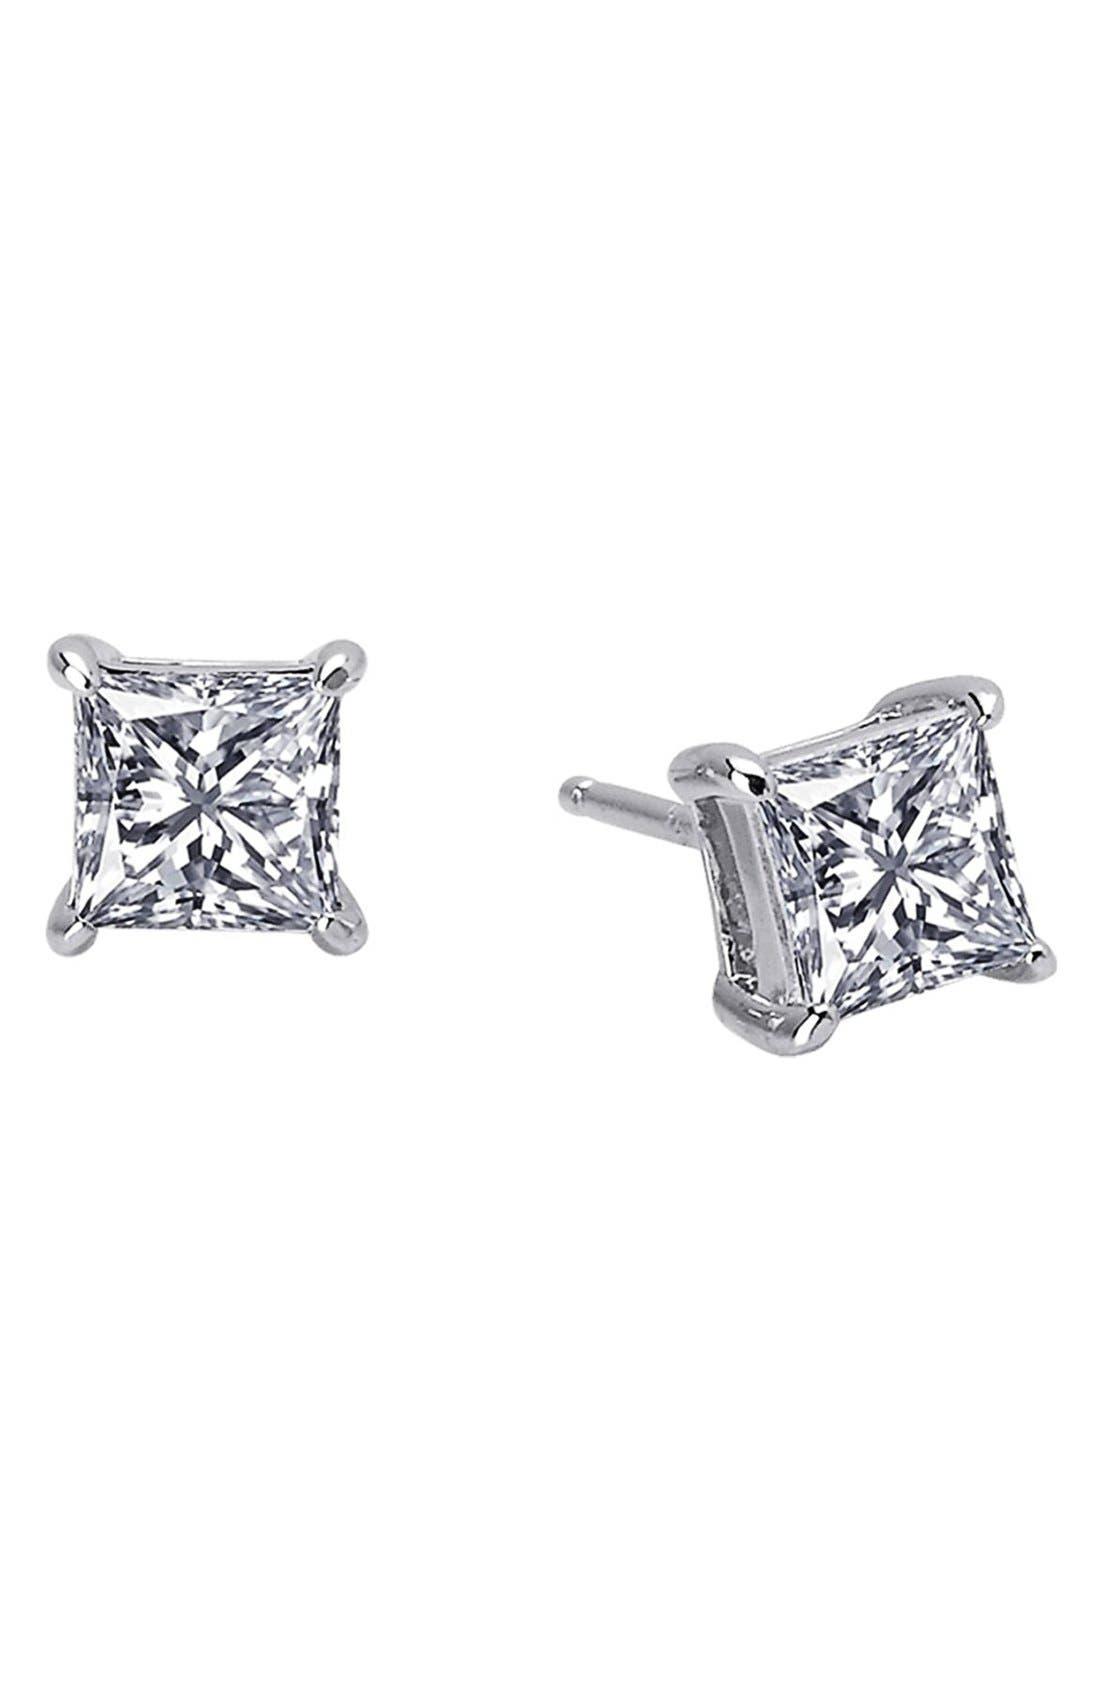 Lafonn 'Lassaire' Princess Cut Stud Earrings